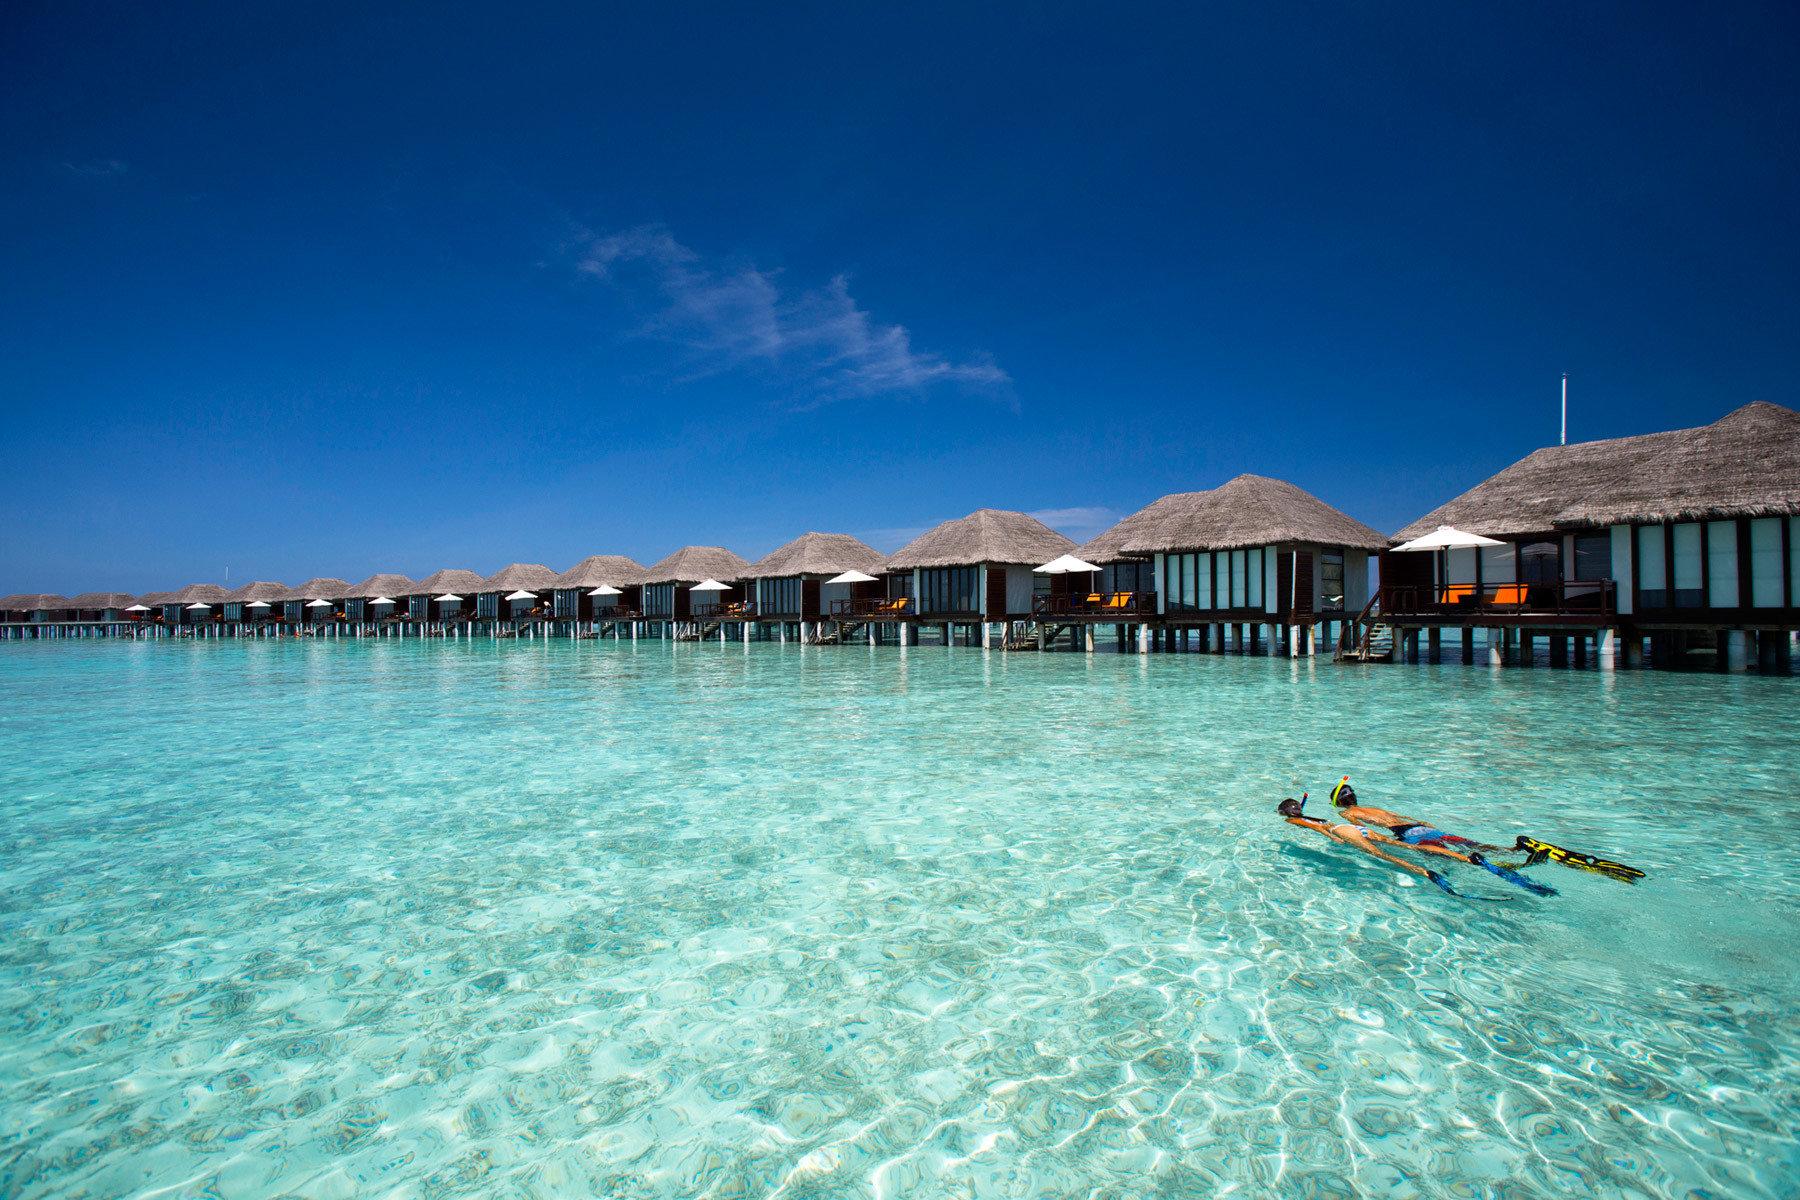 Hotels water sky swimming pool leisure Sea Beach Ocean Resort swimming caribbean Lagoon Pool day